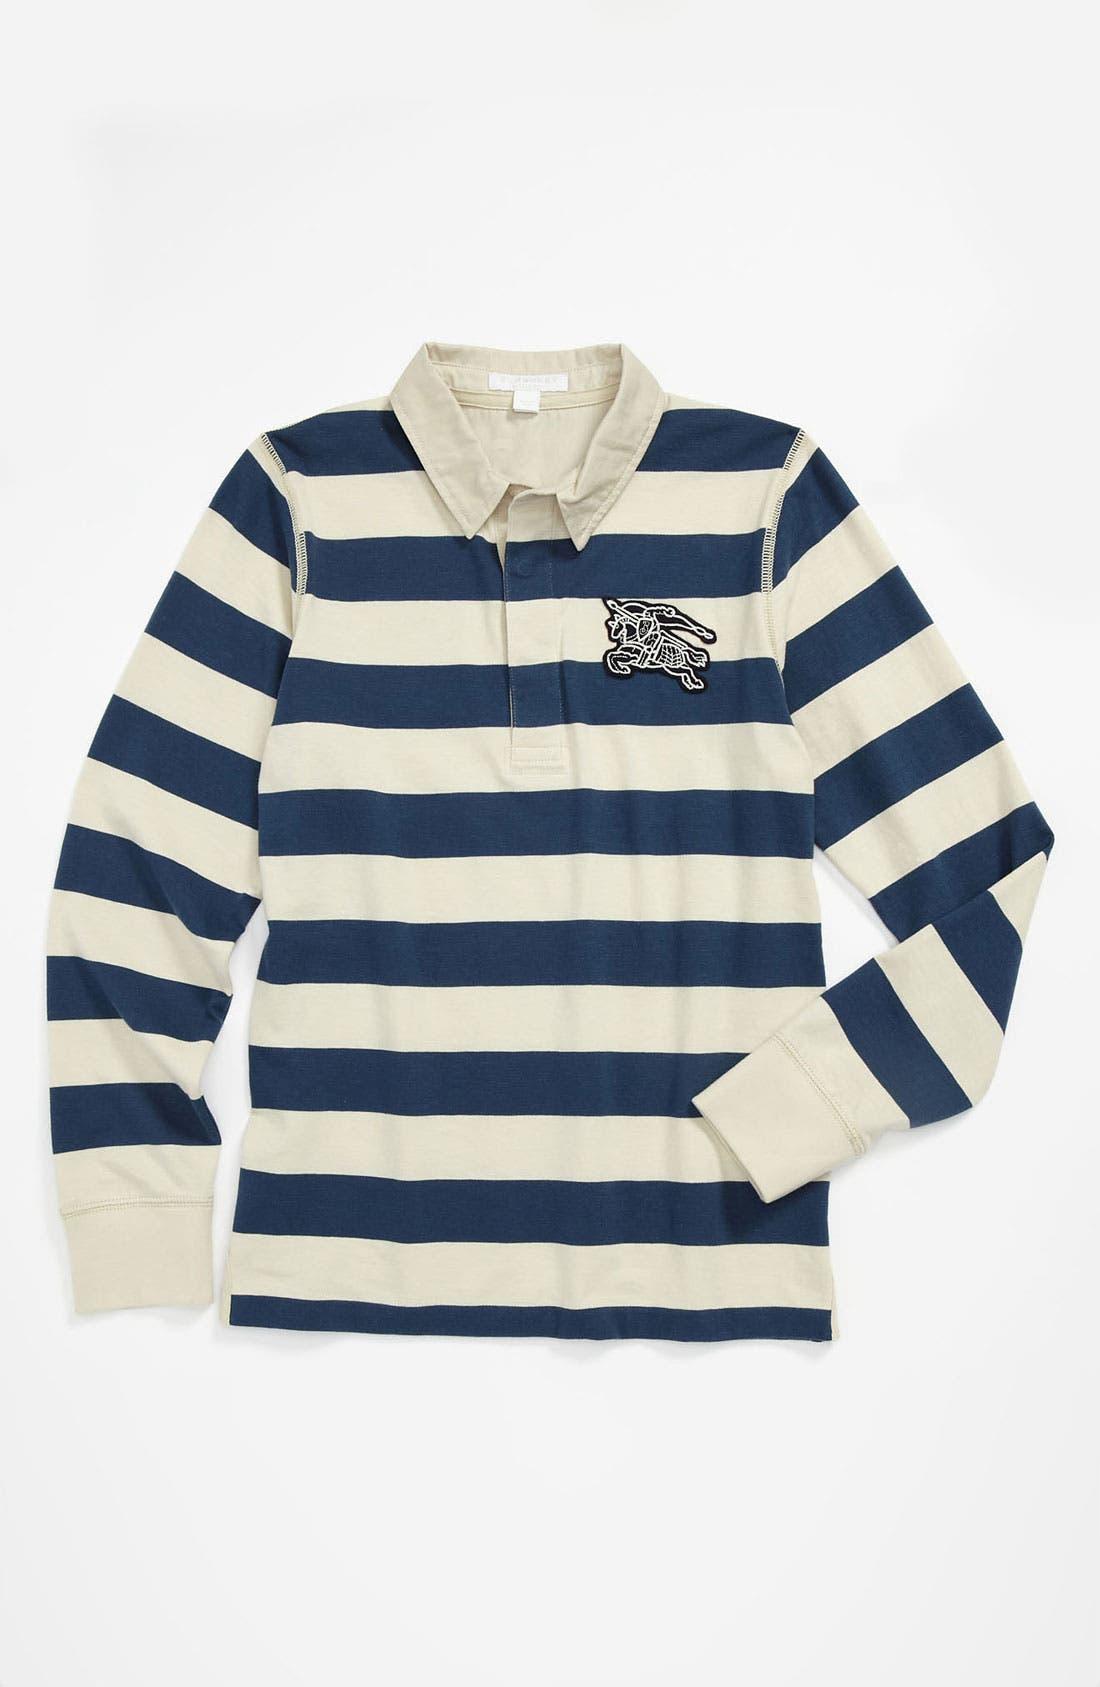 Alternate Image 1 Selected - Burberry 'Mini Beecroft' Stripe Polo Shirt (Little Boys & Big Boys)